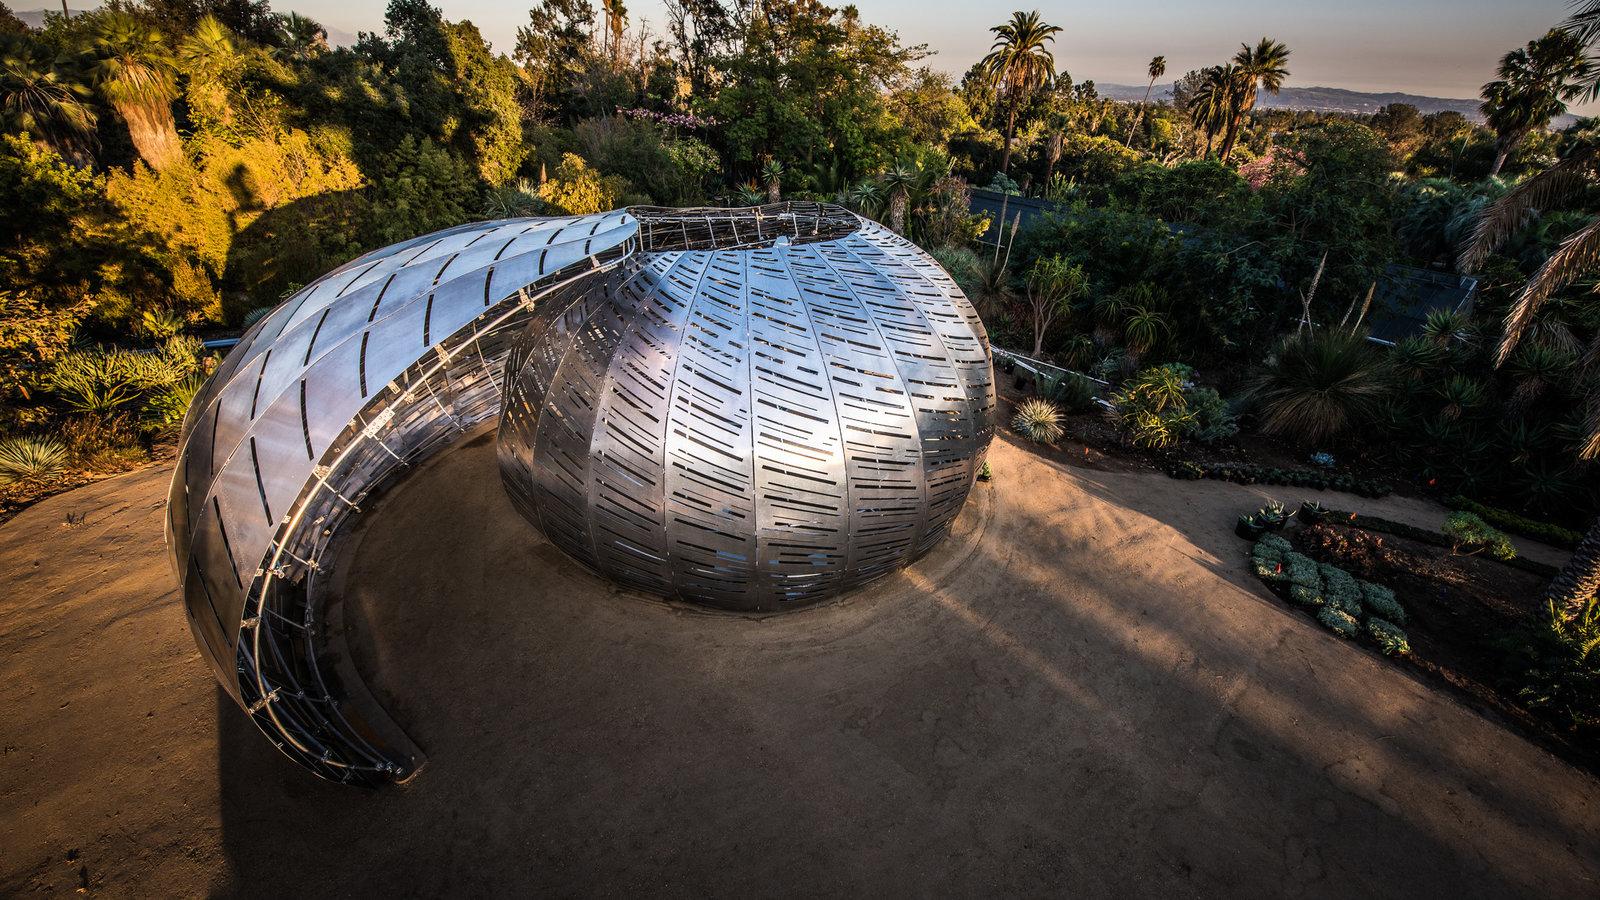 The Orbit Pavilion produces sounds based on orbiting satellites.Courtesy NASA/JPL-Caltech